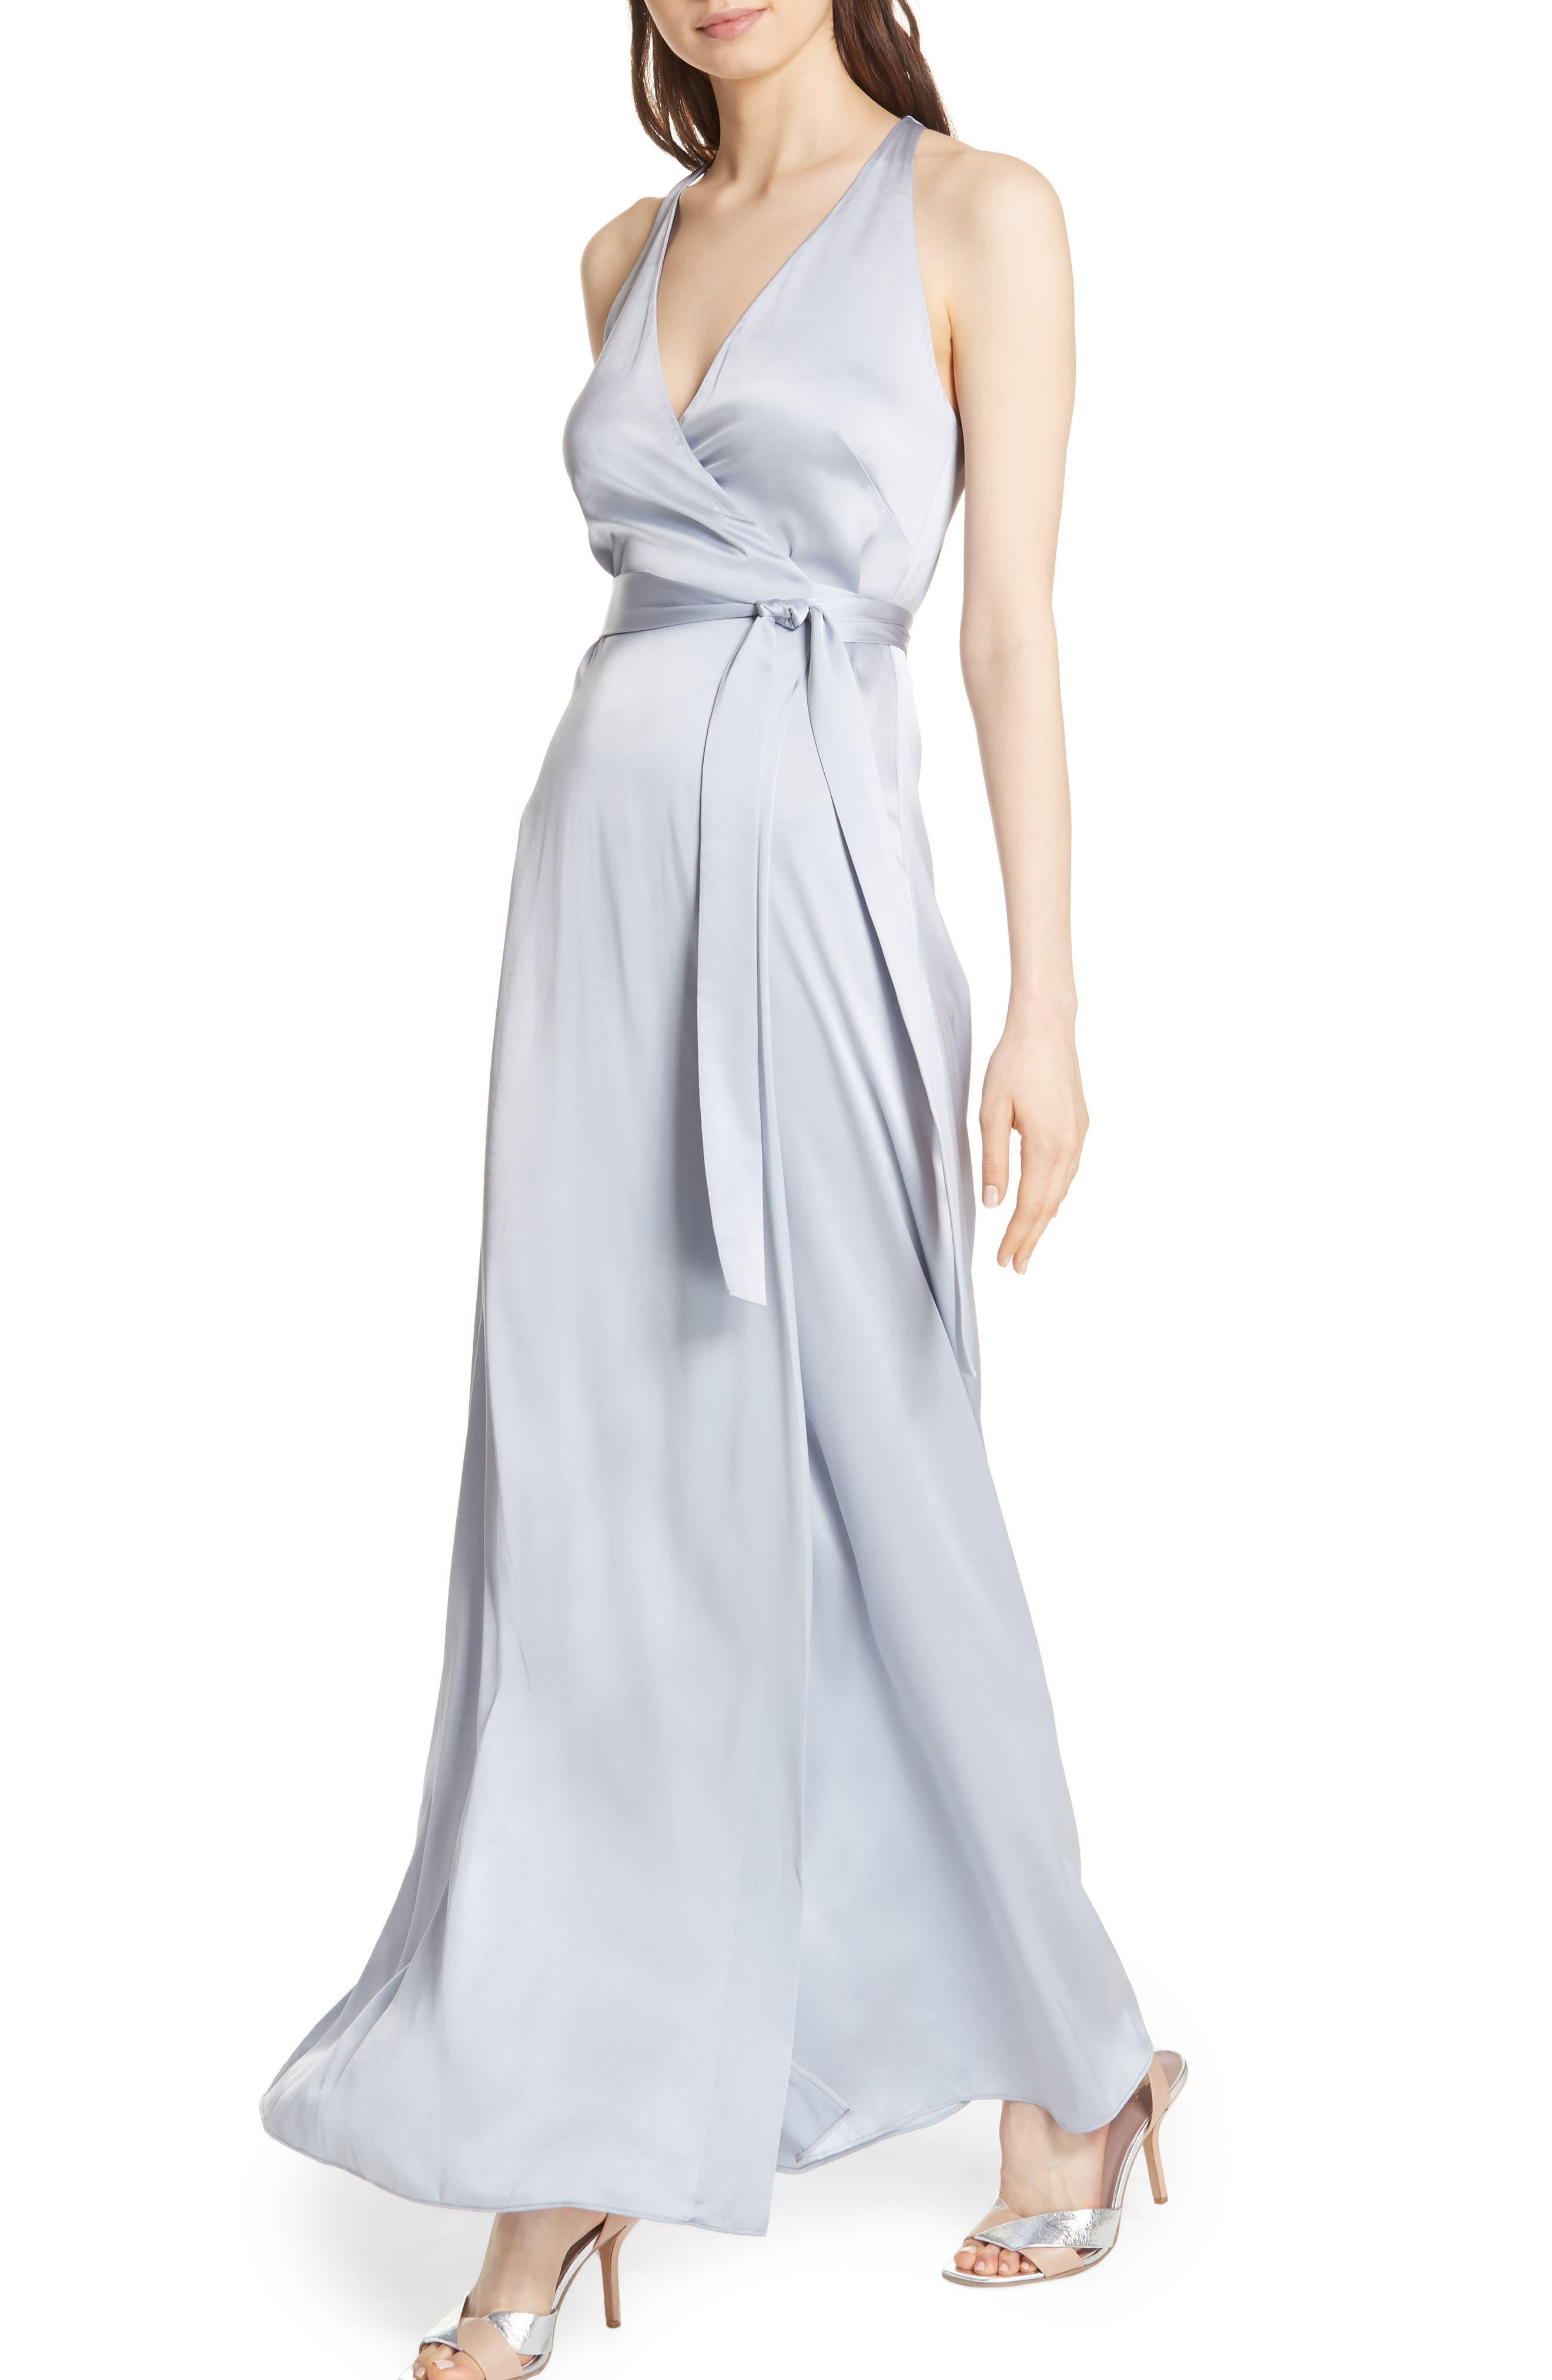 Diane von Furstenberg Wrap Gown,                             Alternate thumbnail 4, color,                             031